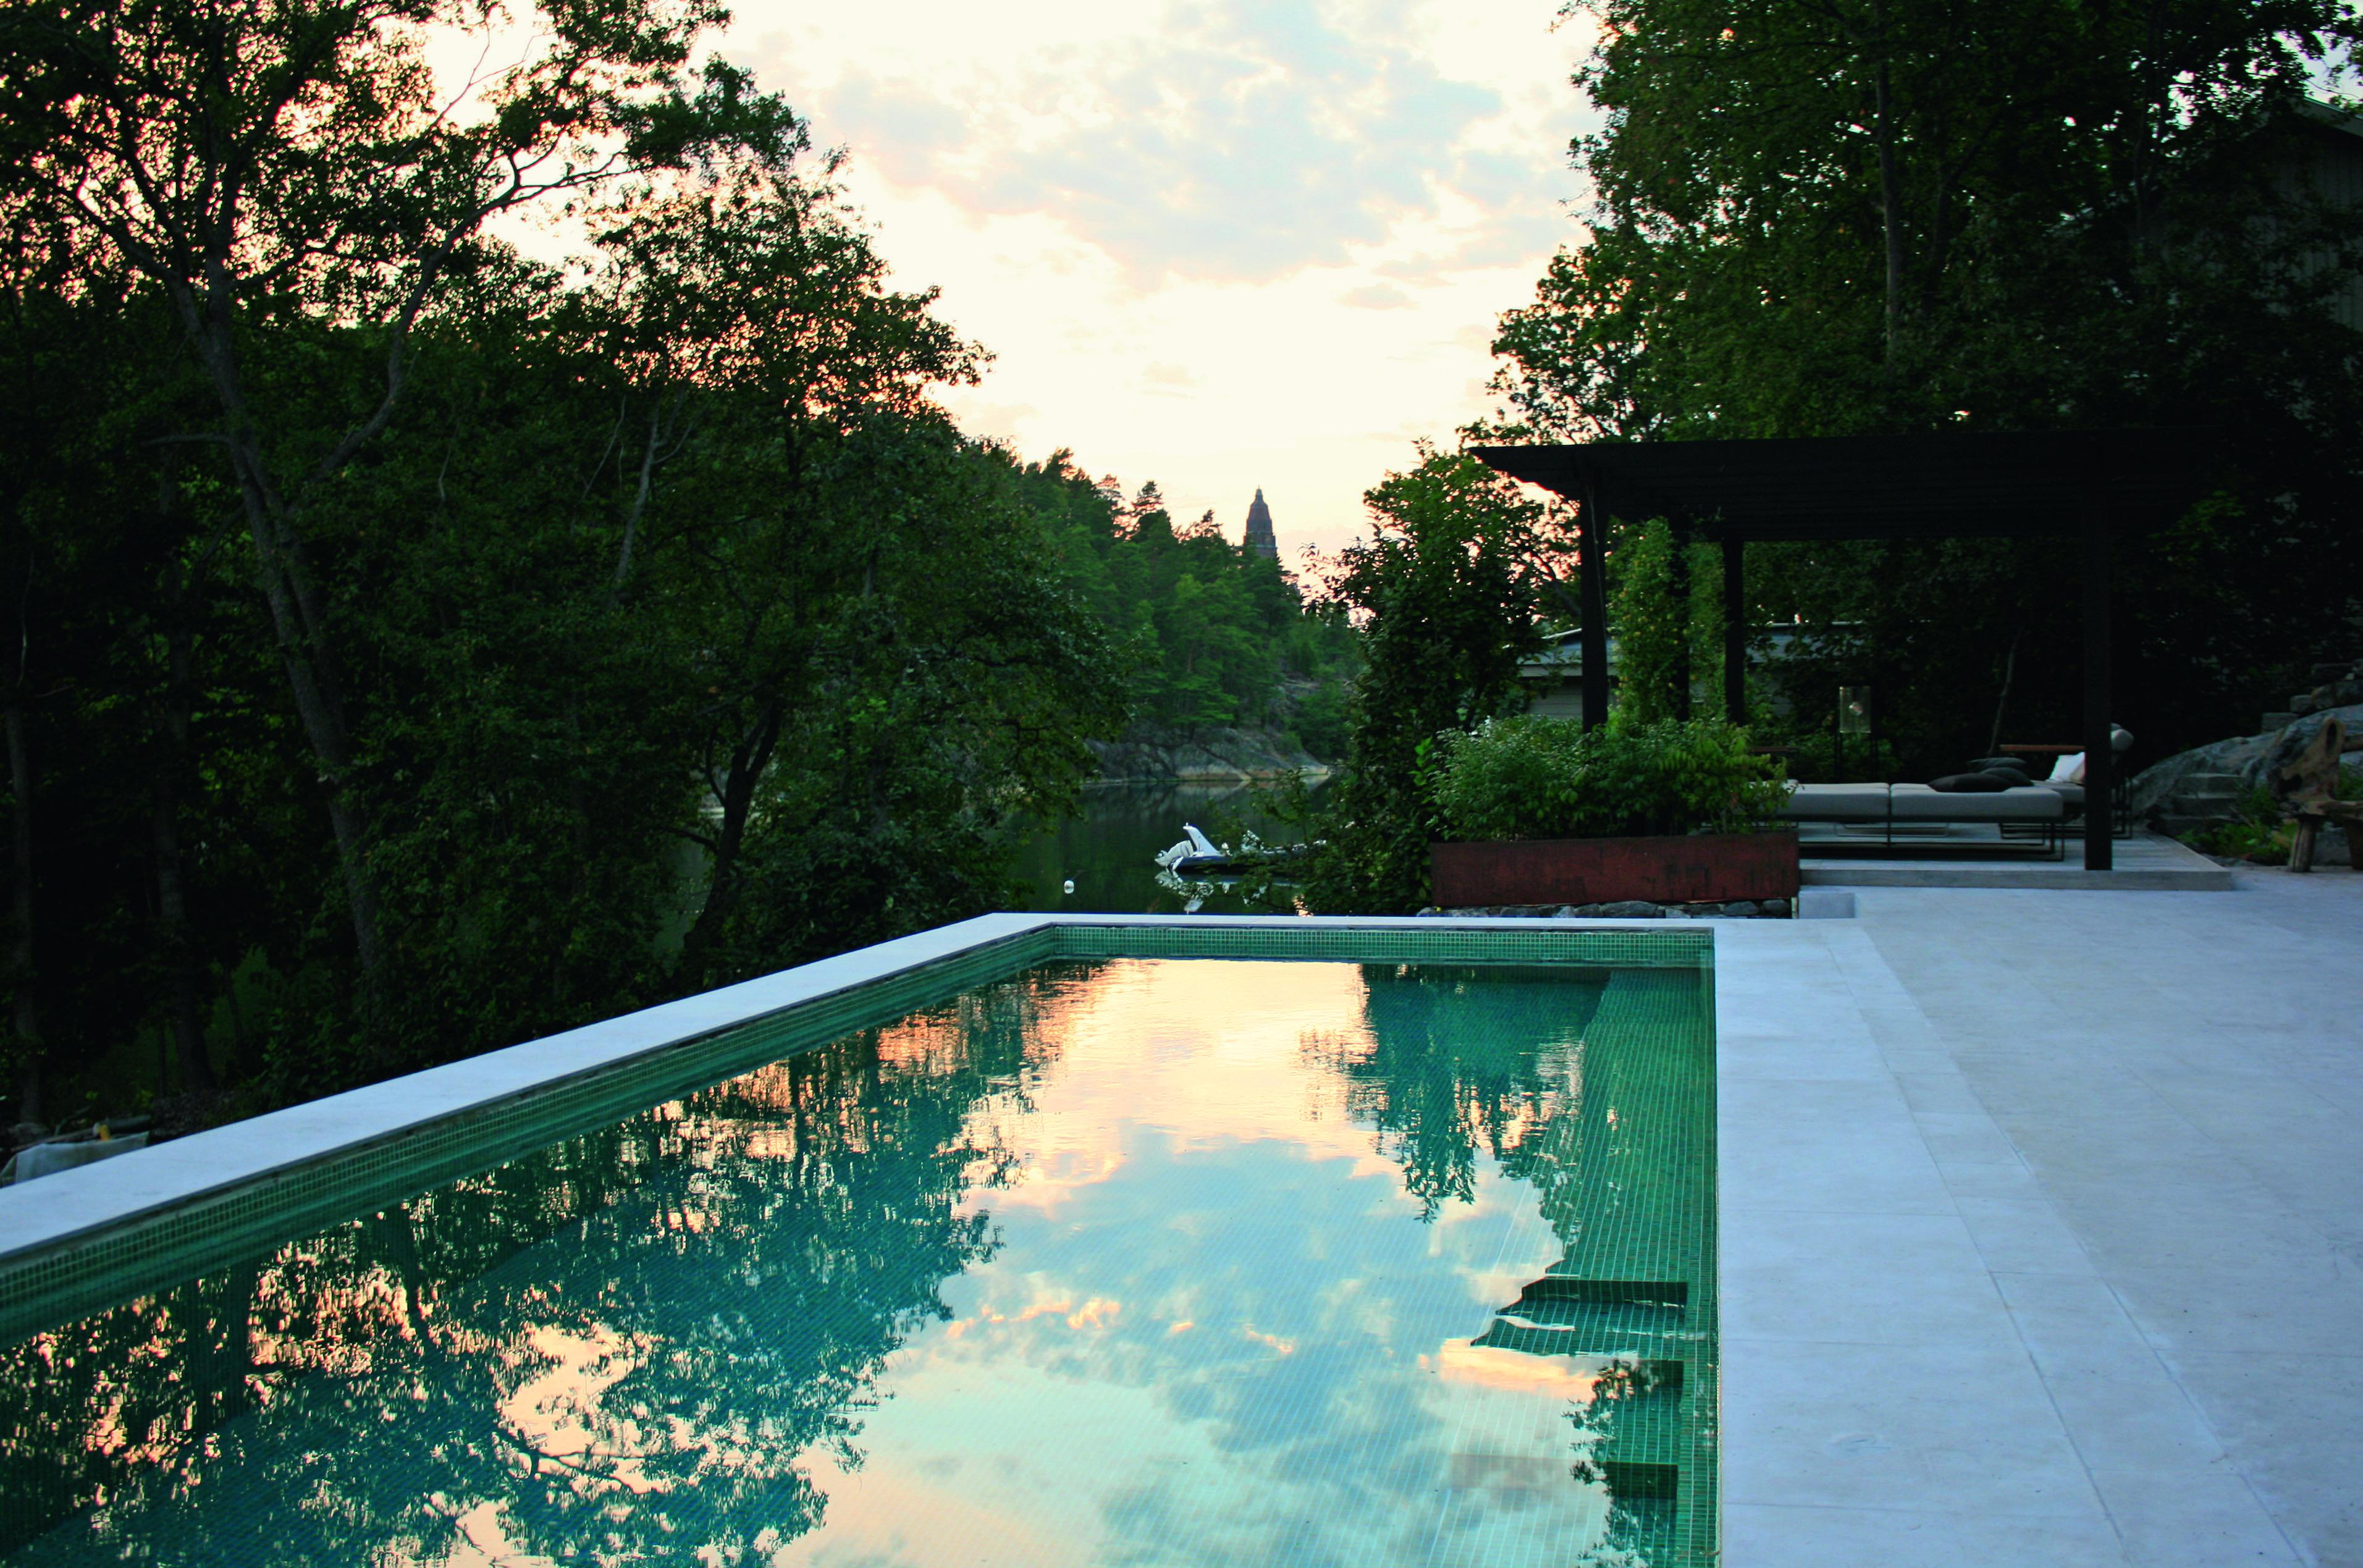 New Nordic Gardens by Annika Zetterman, Thinking Outside the Boxwood